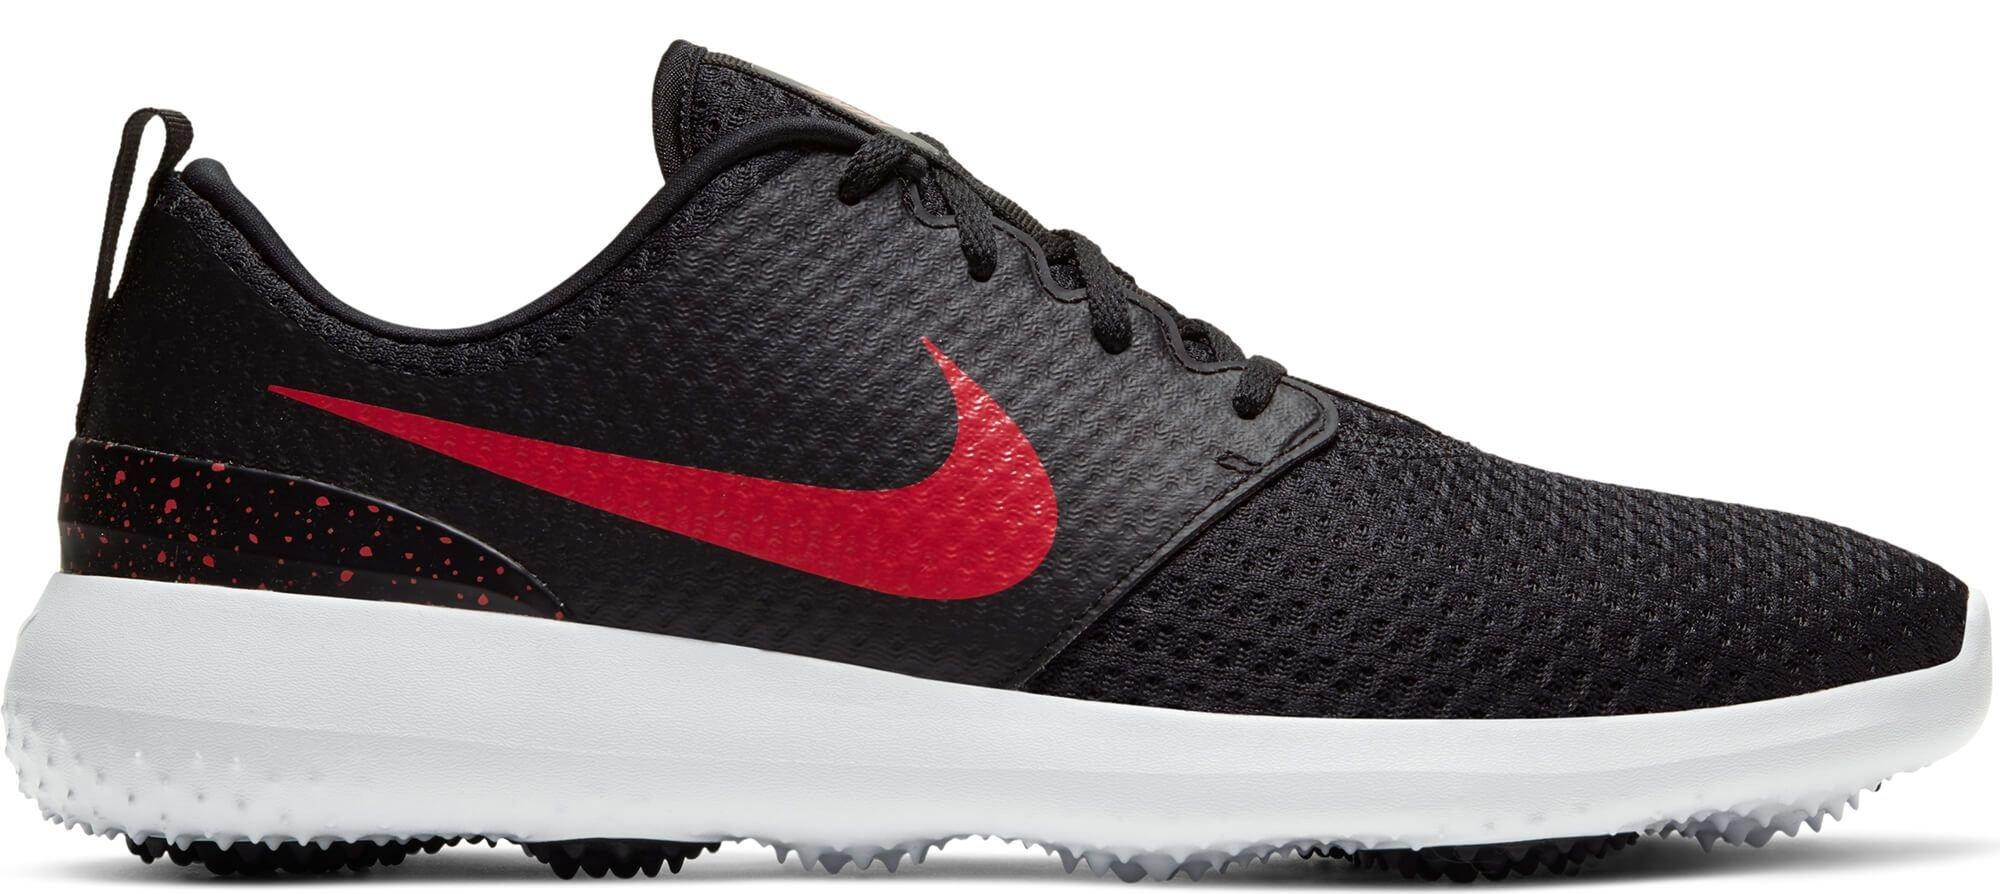 Ir a caminar enviar Frágil  Nike Roshe G Golf Shoes Black/University Red/White - Carl's Golfland